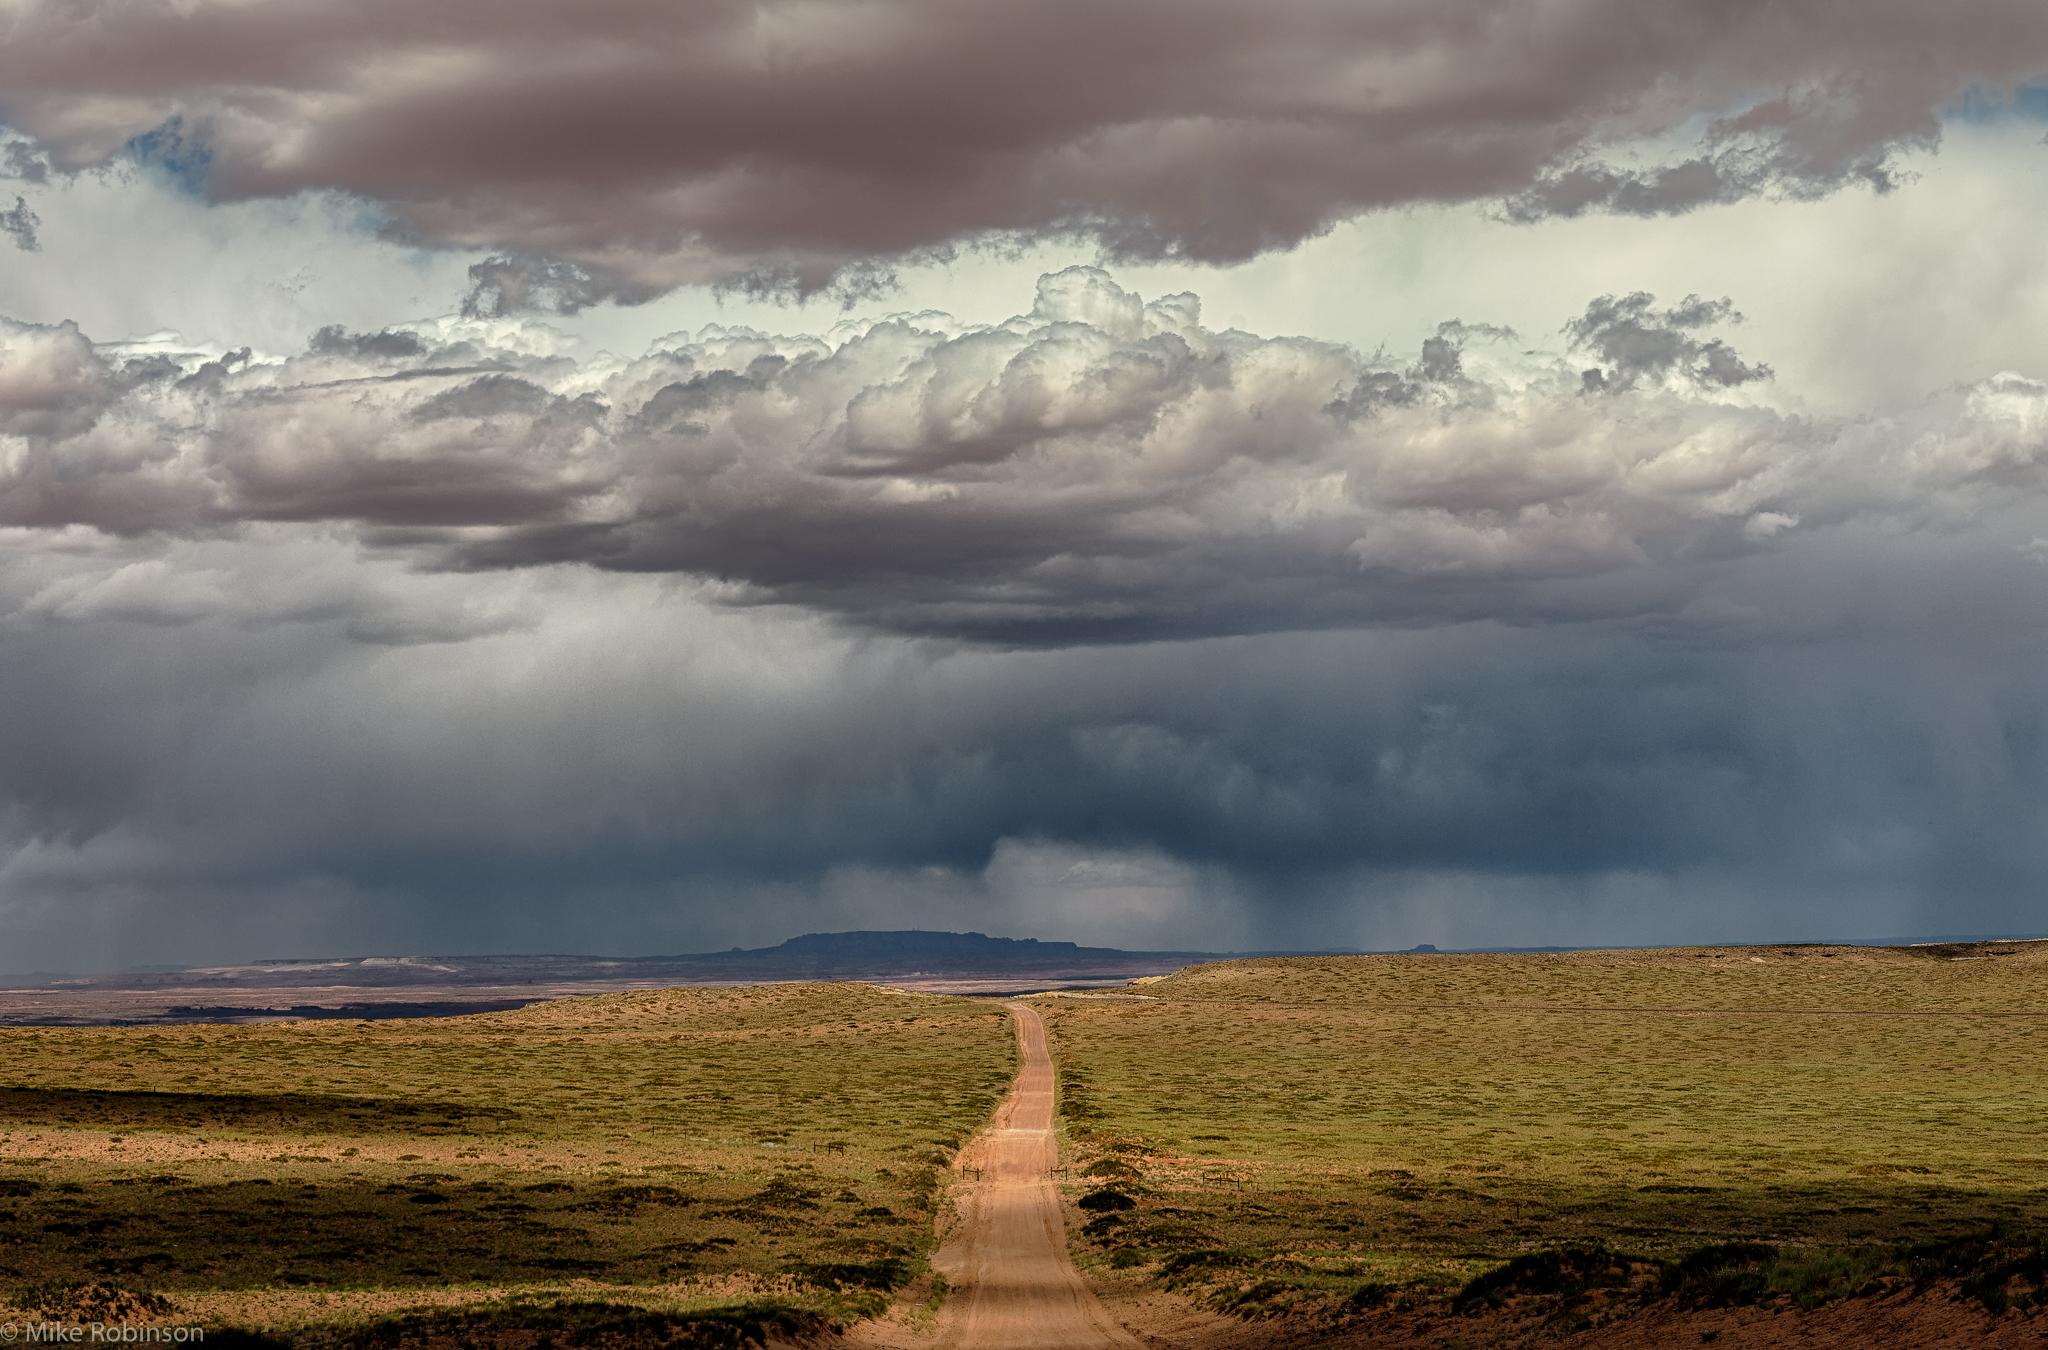 TX_Road_Into_Rain_HDR